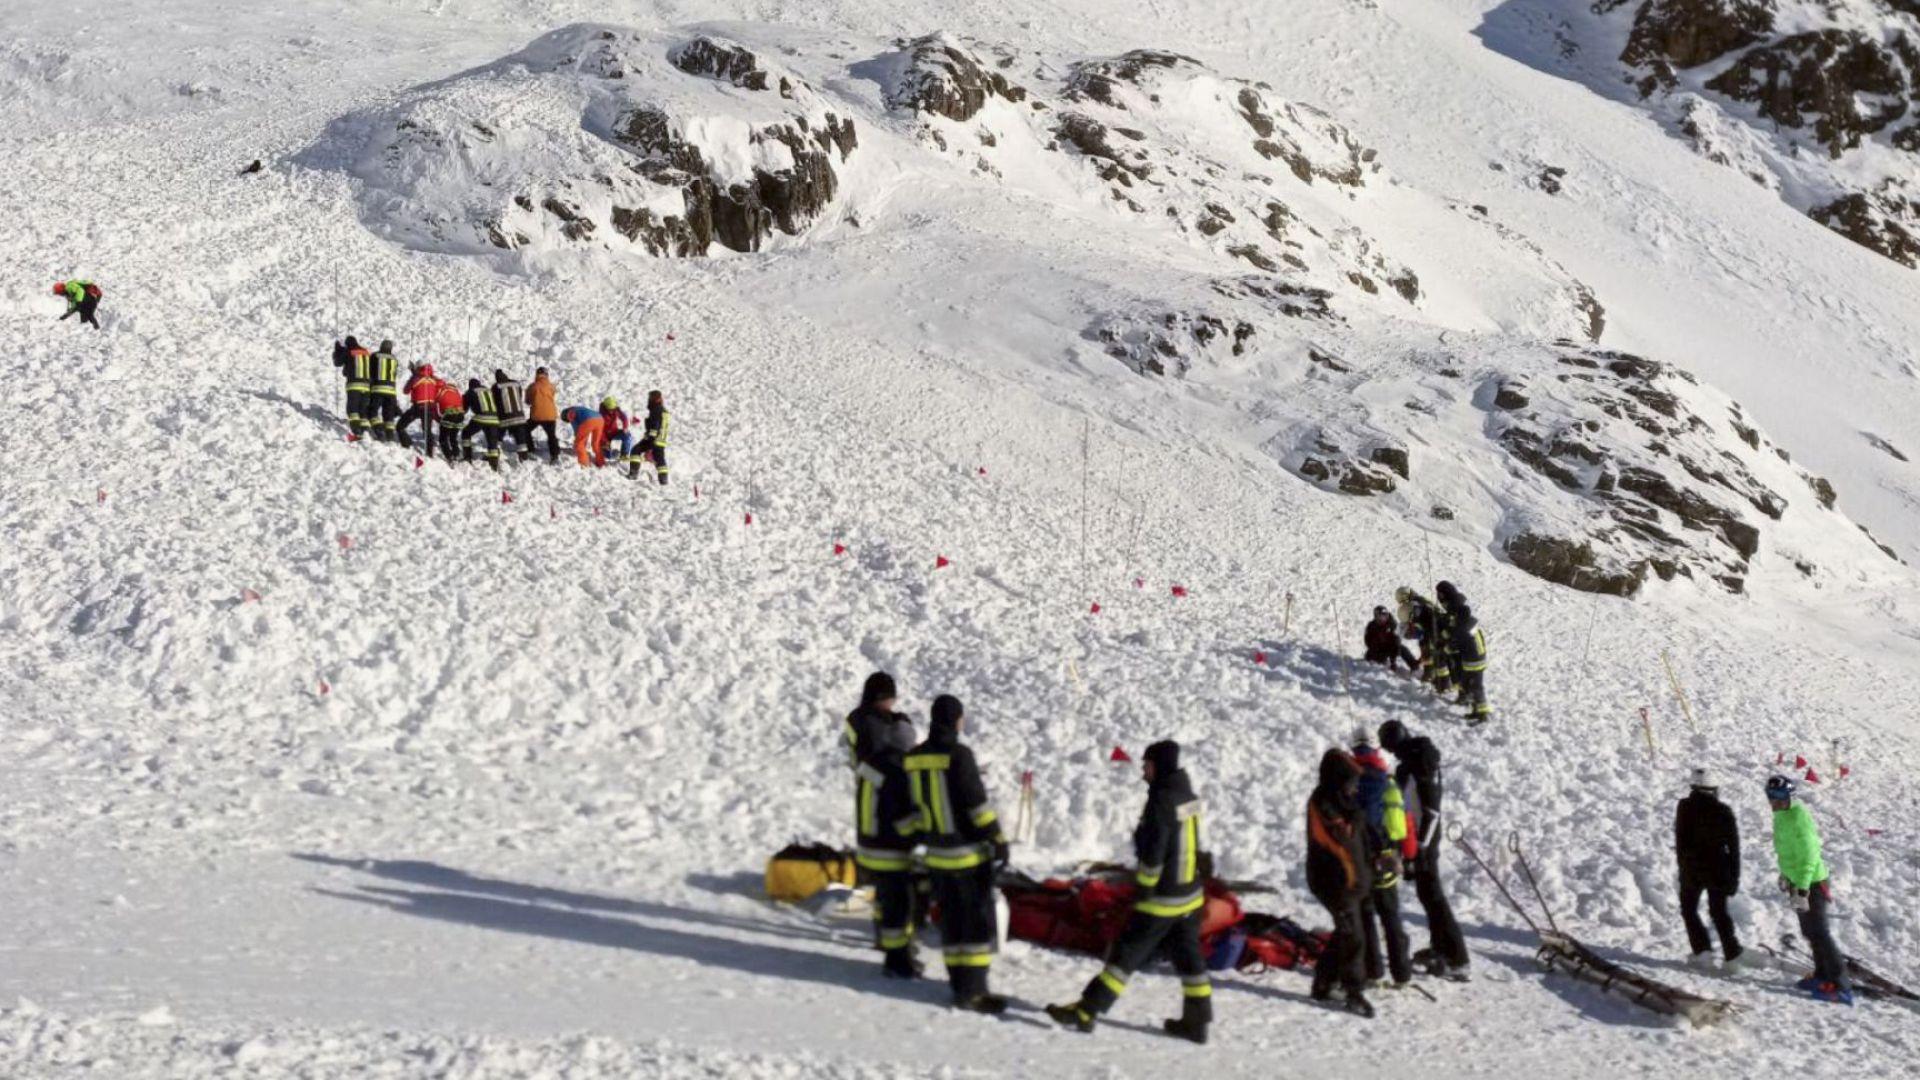 Лавина уби жена и две малки деца в италианските Алпи, друга затрупа скиор (видео)